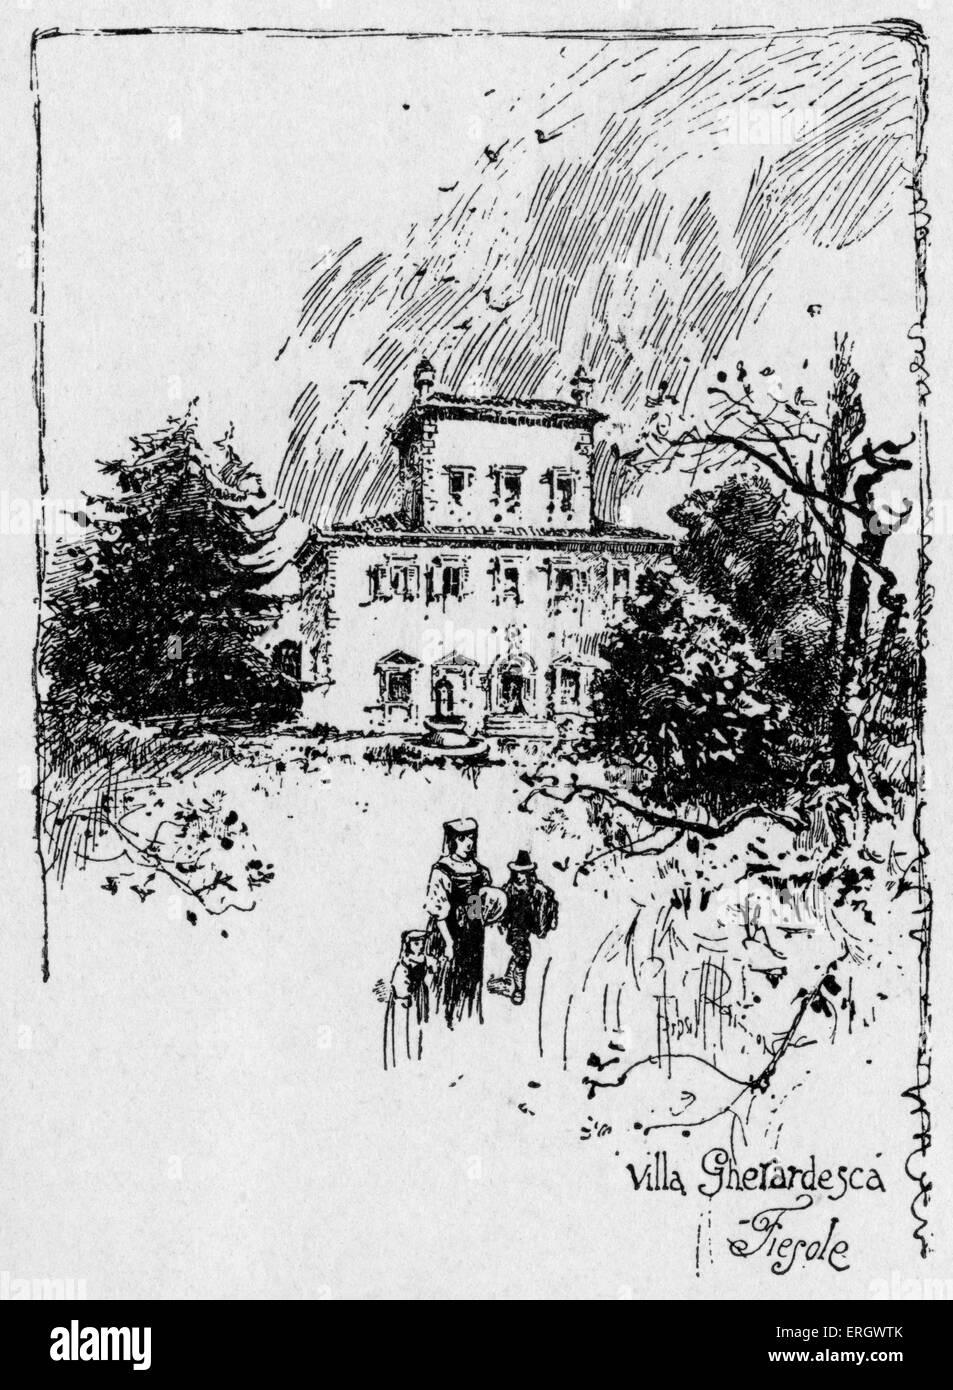 Walter Savage Landor's villa at Fiesole. WSL: English writer and poet, 30 January 1775 – 17 September 1864. - Stock Image